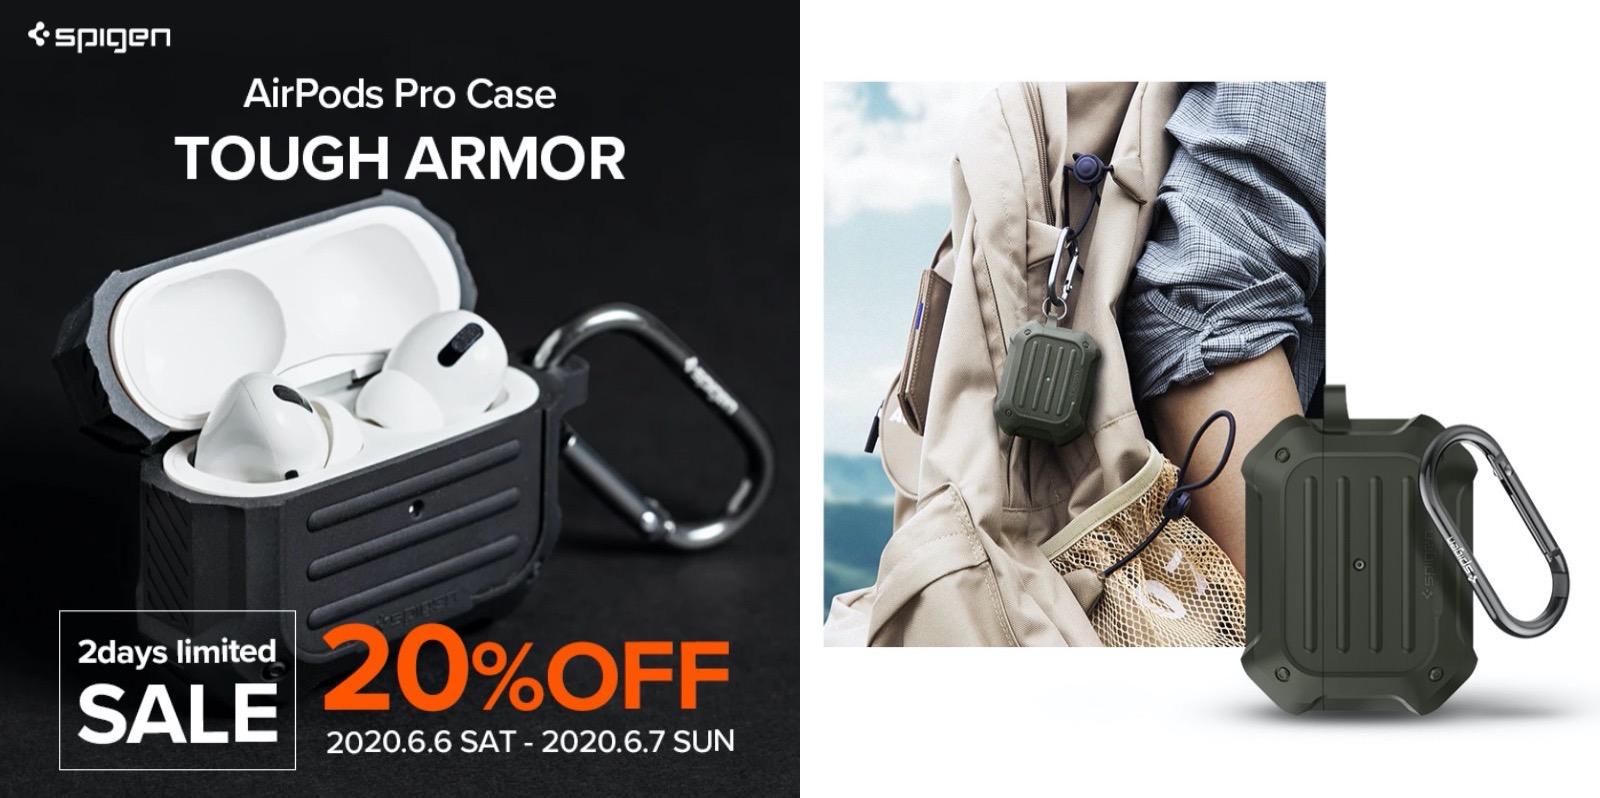 AirPods Pro Case Tough Armor Sale